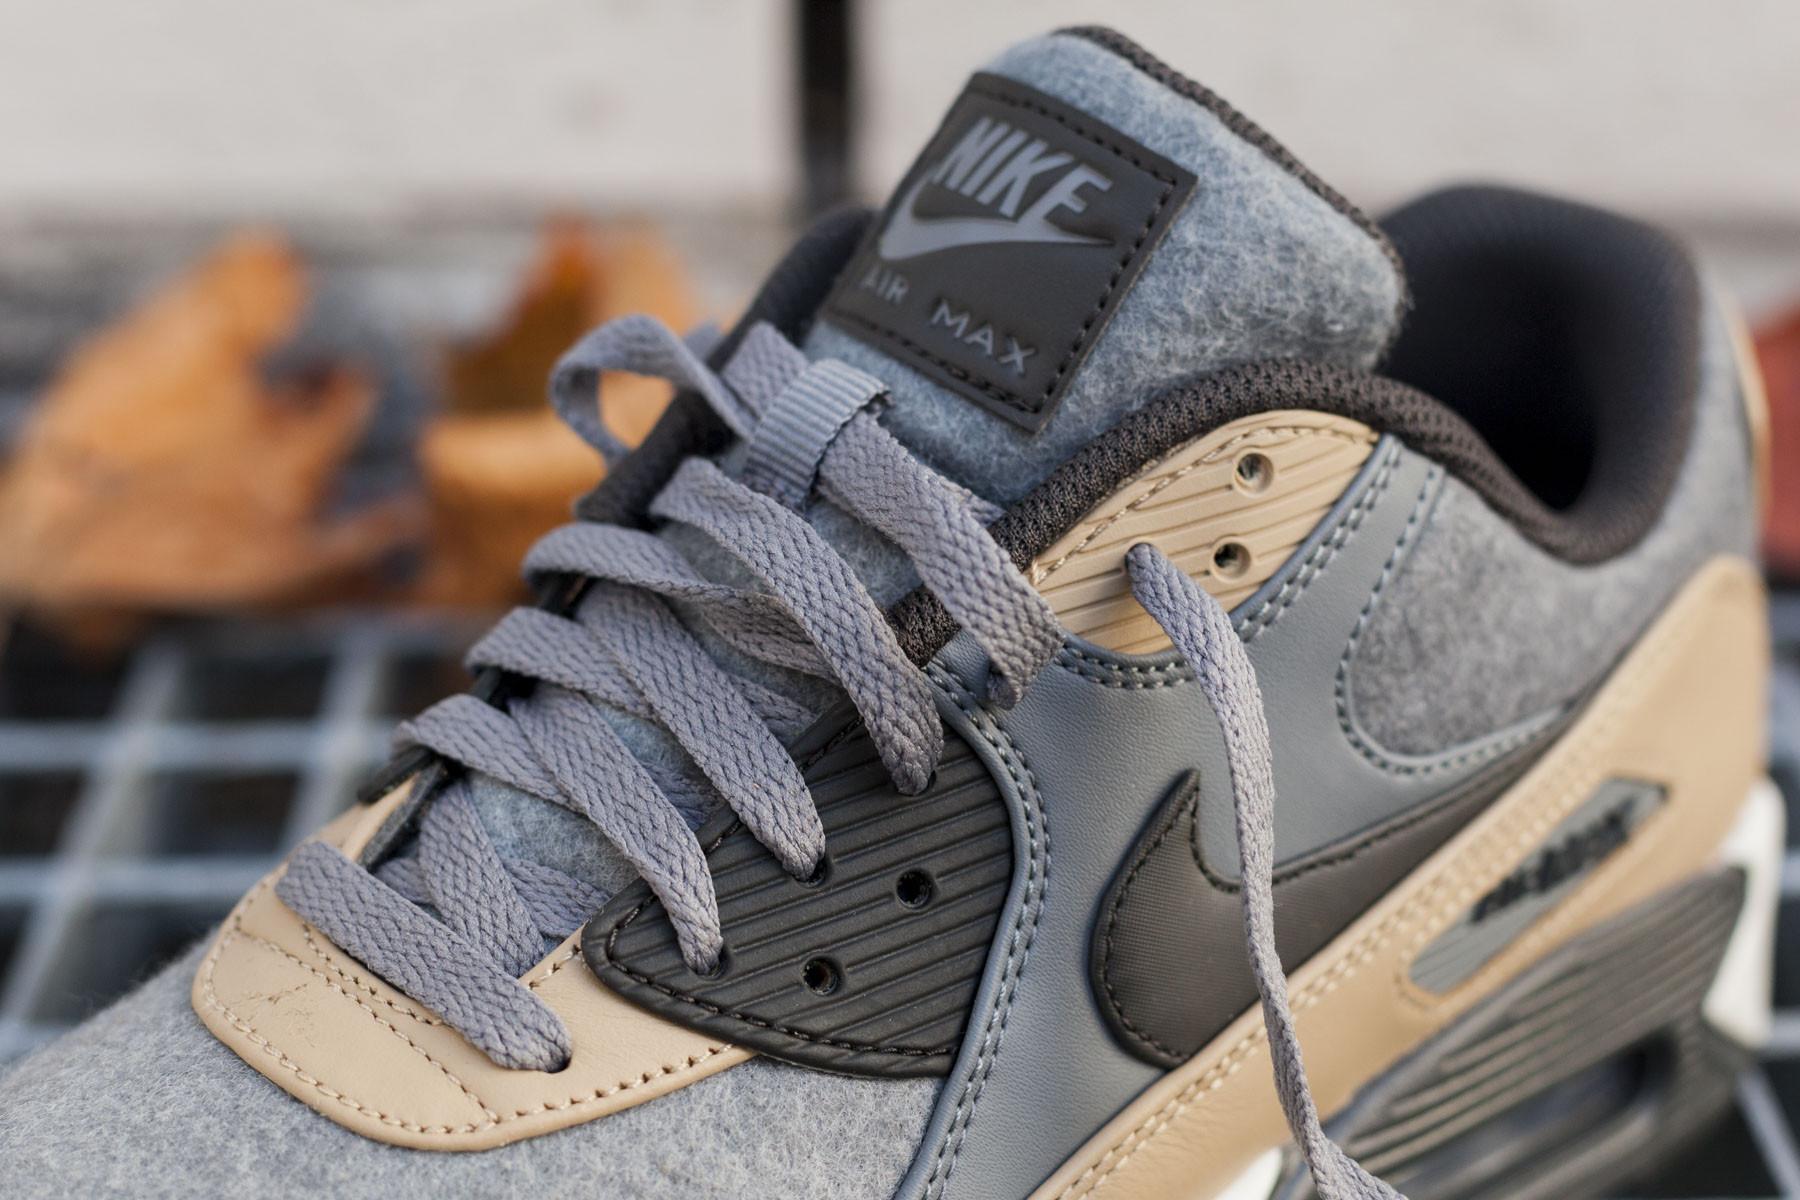 Nike Air Max 90 Premium Cool GreyMushroom 700155 010